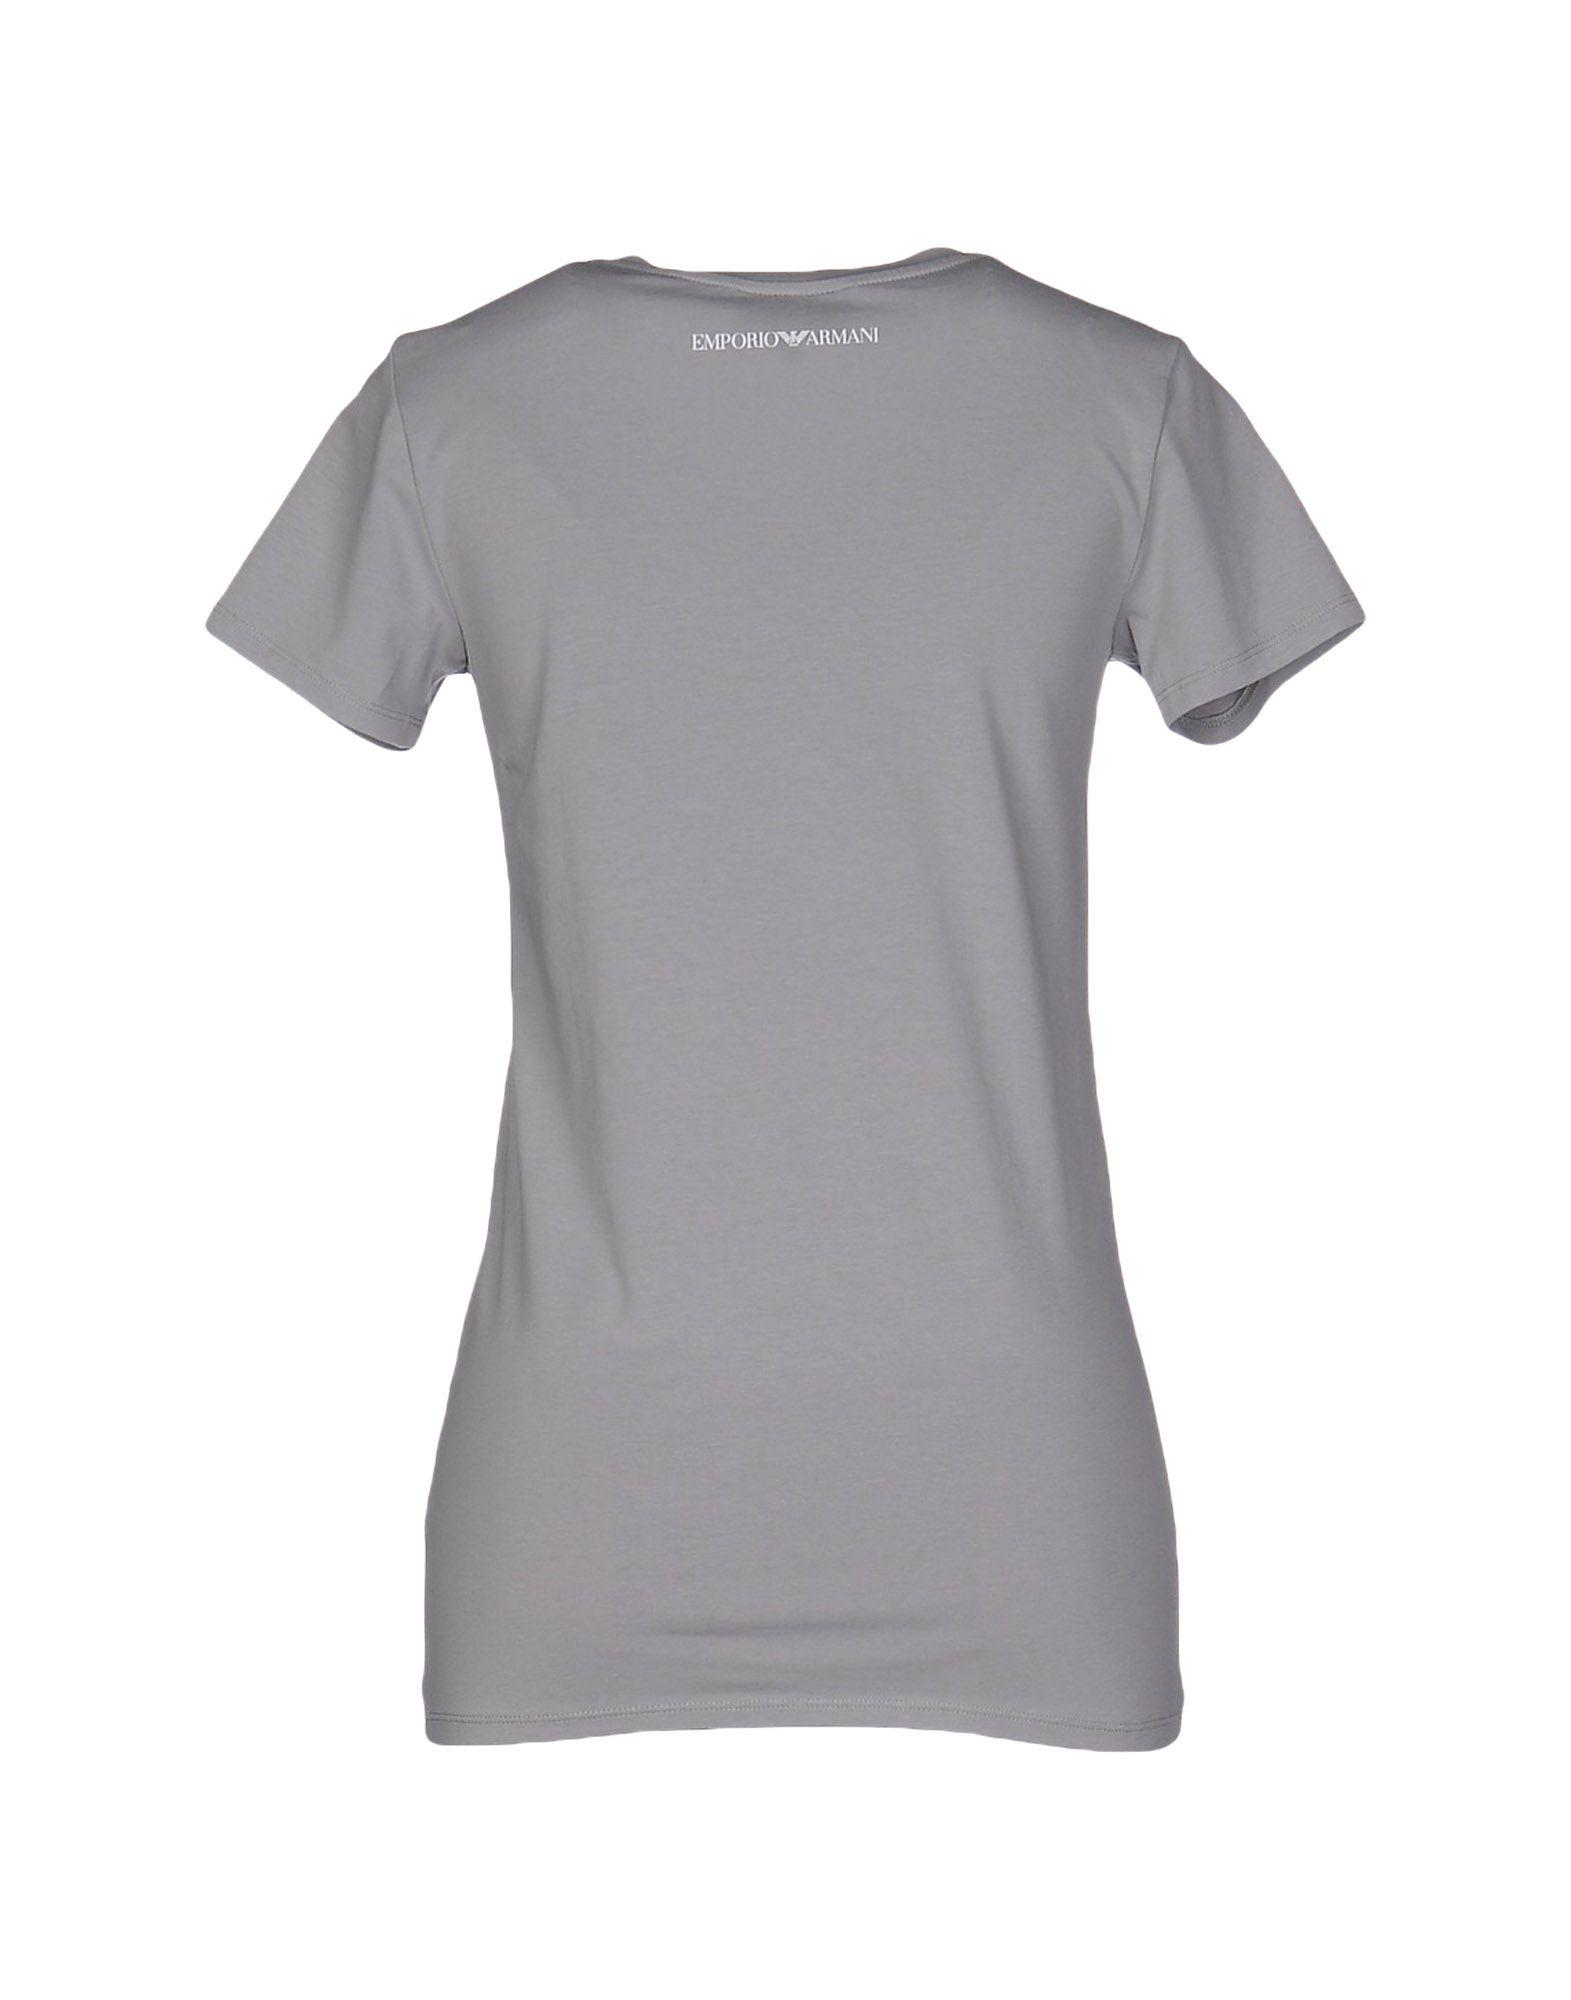 emporio armani t shirt in gray lyst. Black Bedroom Furniture Sets. Home Design Ideas